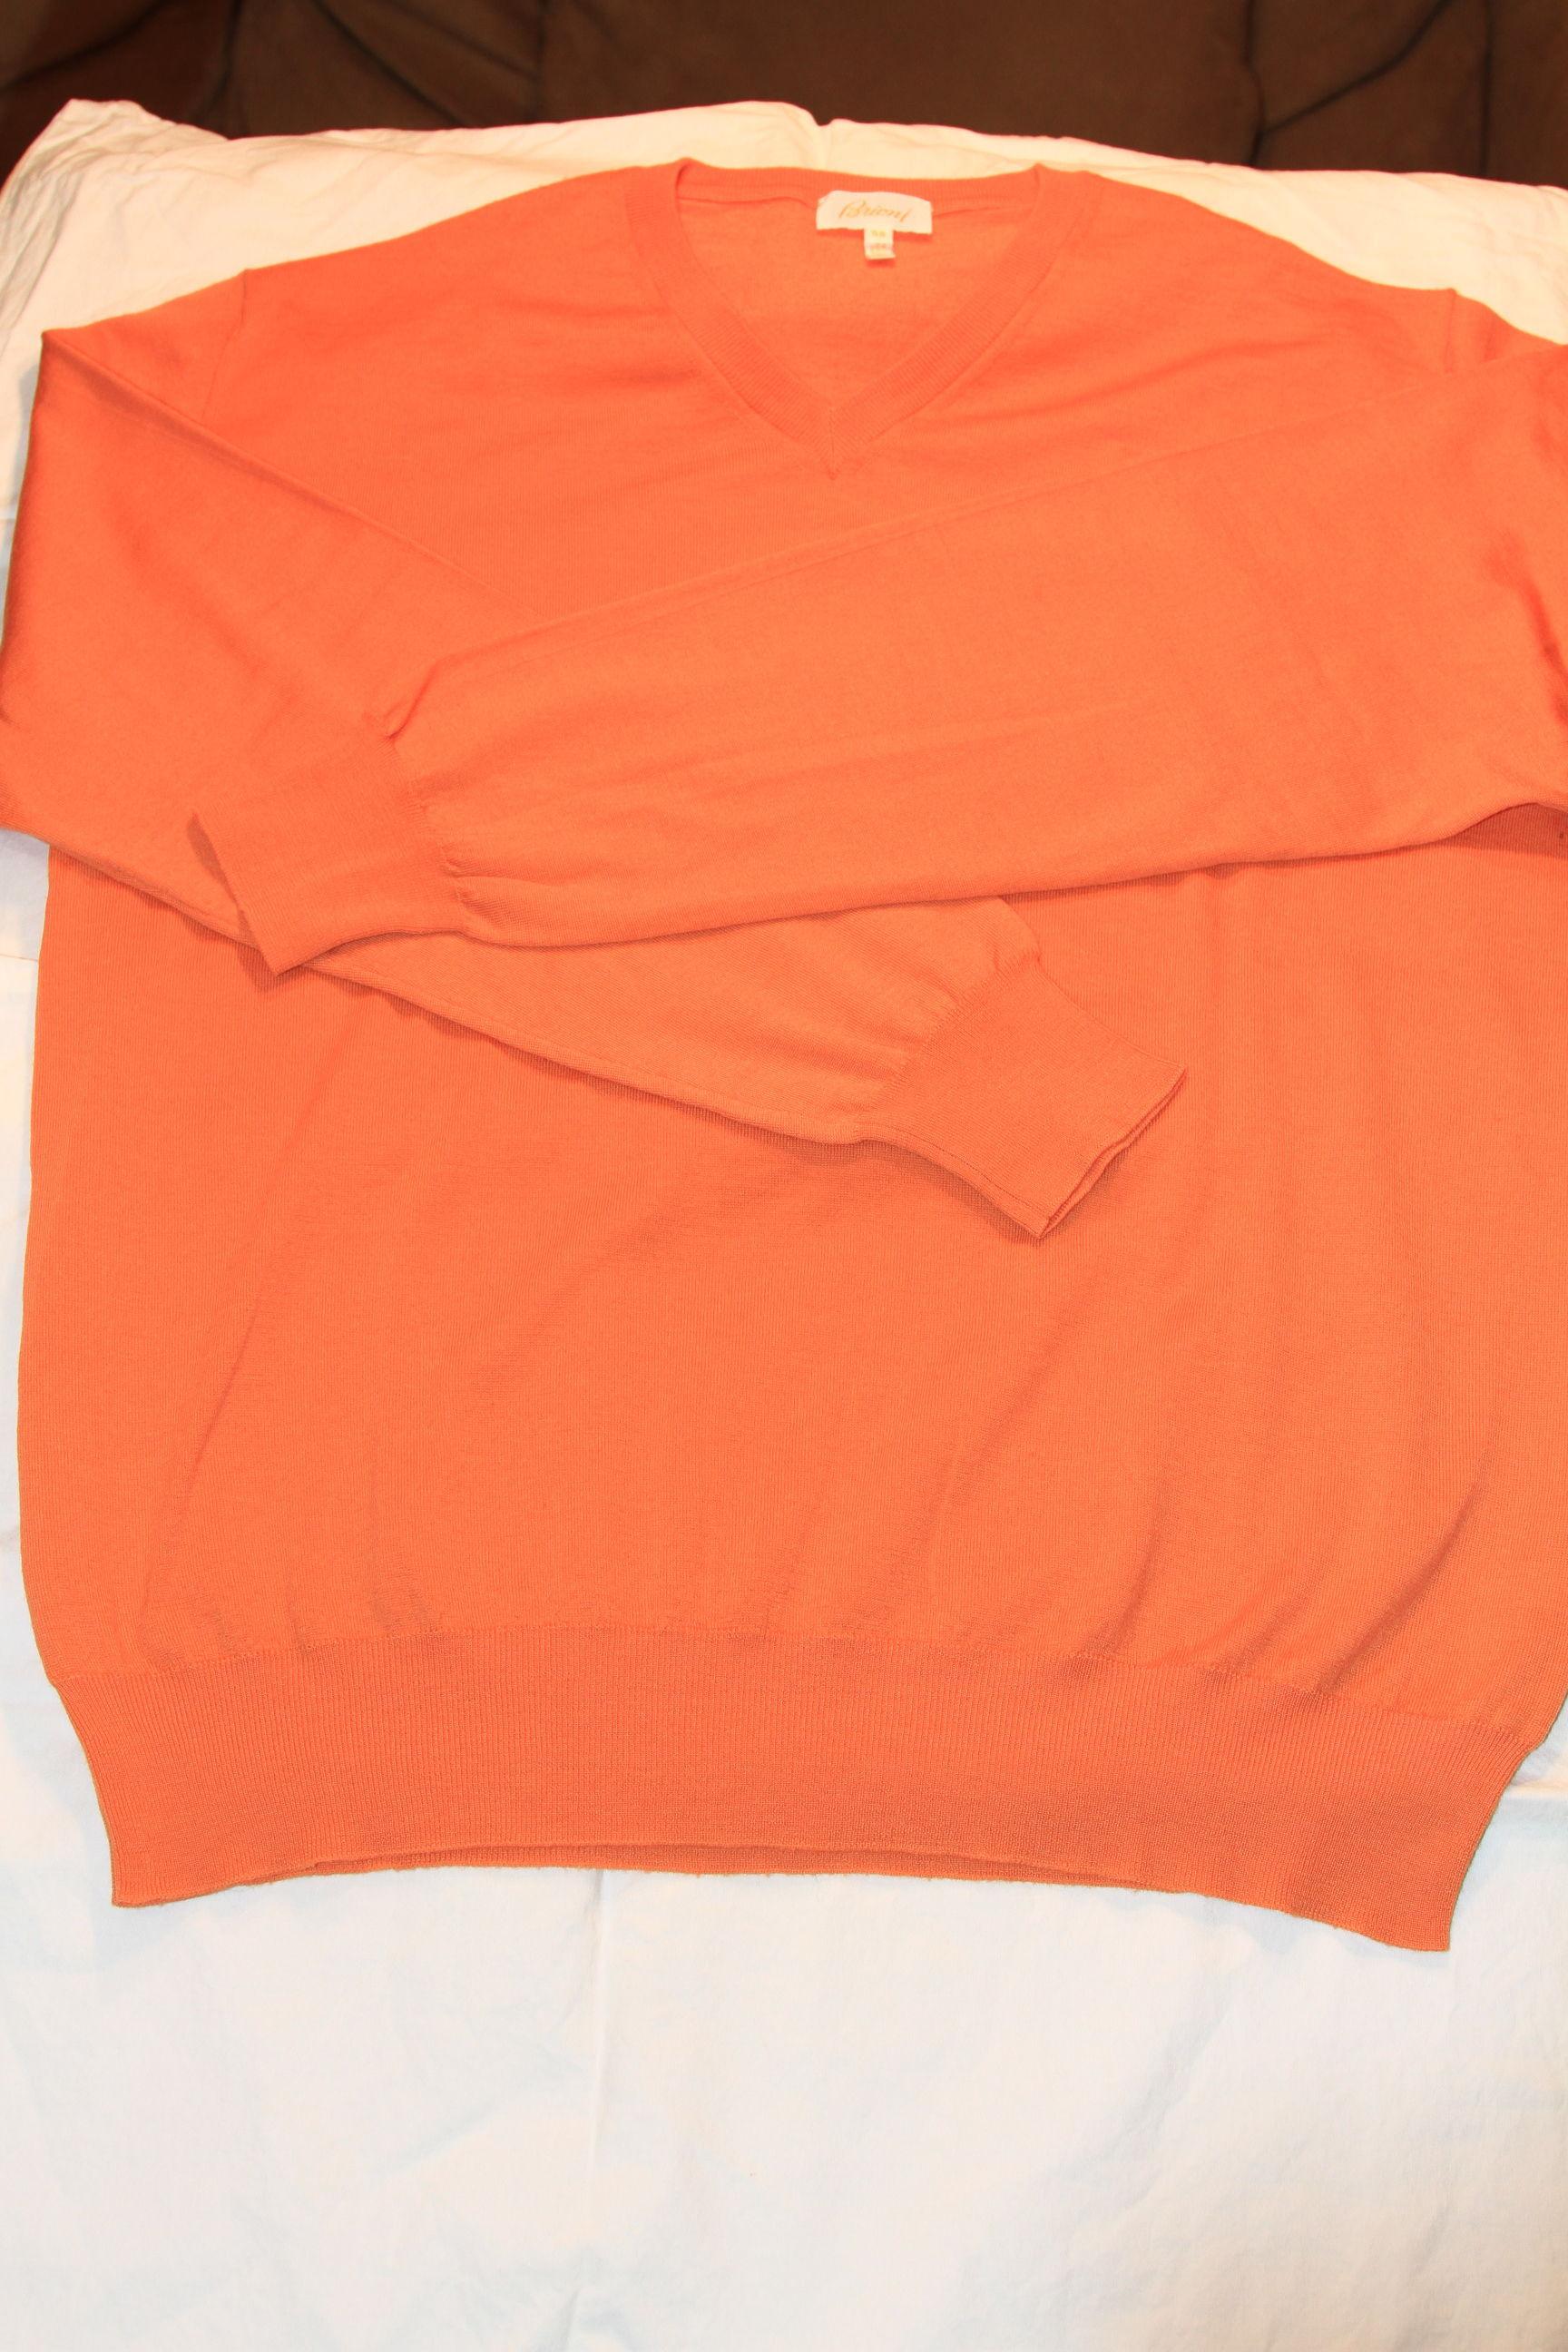 #1 - Brioni Sweater Size 50 Orange V-Neck 100% Lana Wool $100